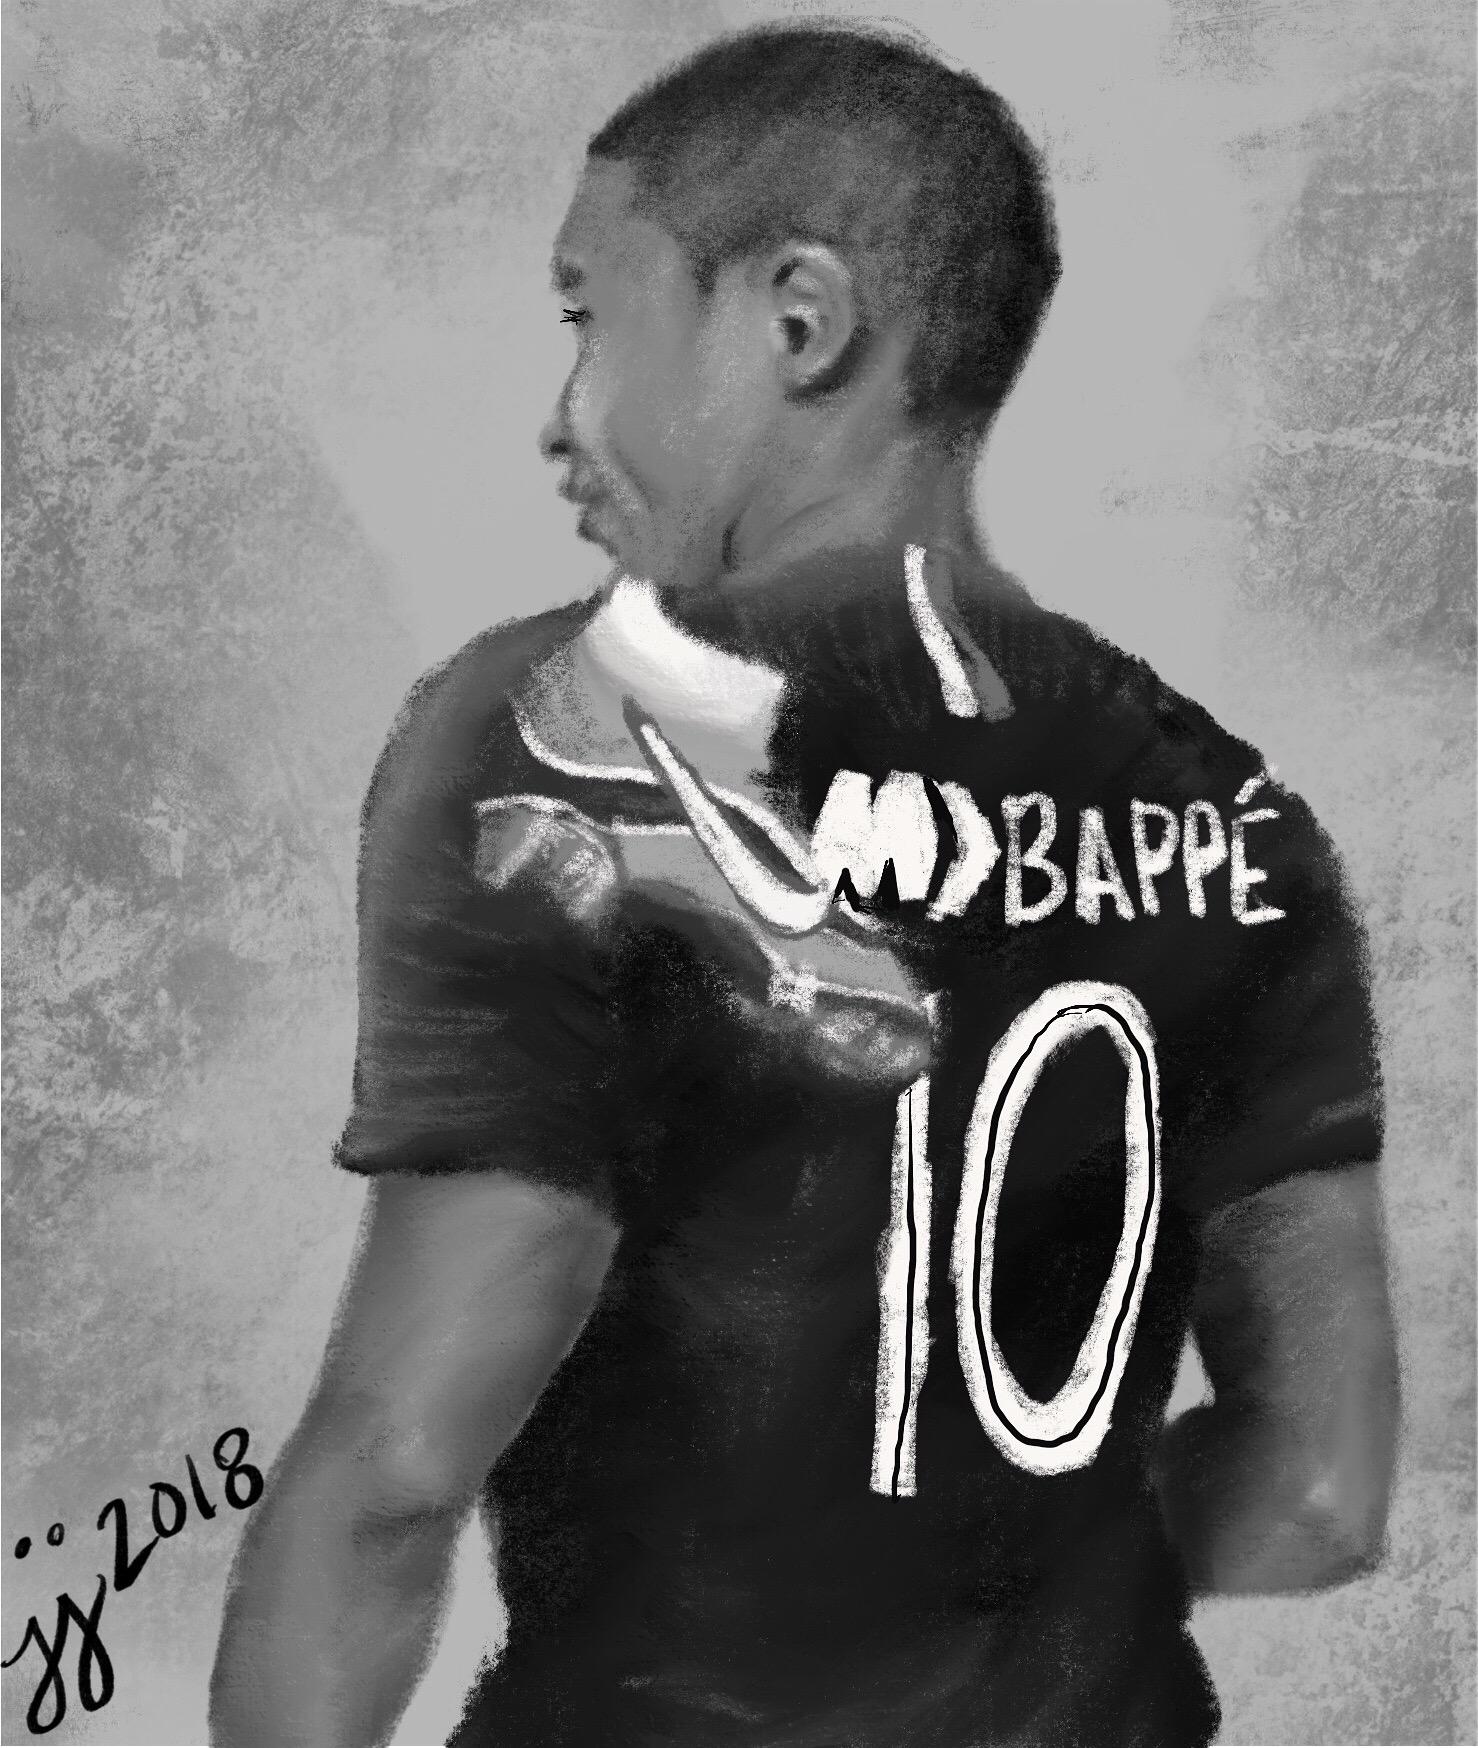 Copy of French Footballer Kylian Mbappé